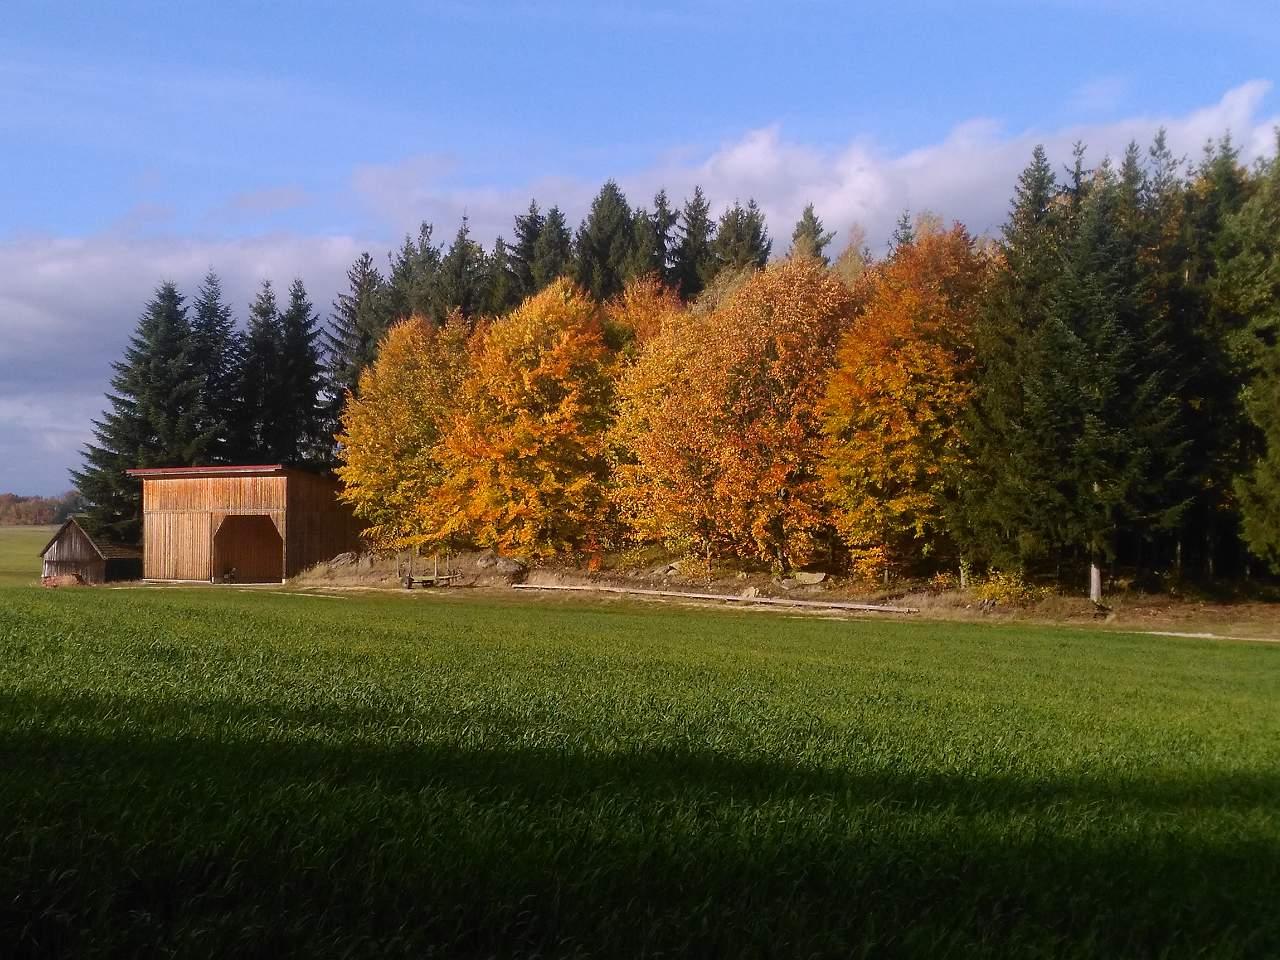 Rudi Jahn: Herbst Josefsdorf 2017